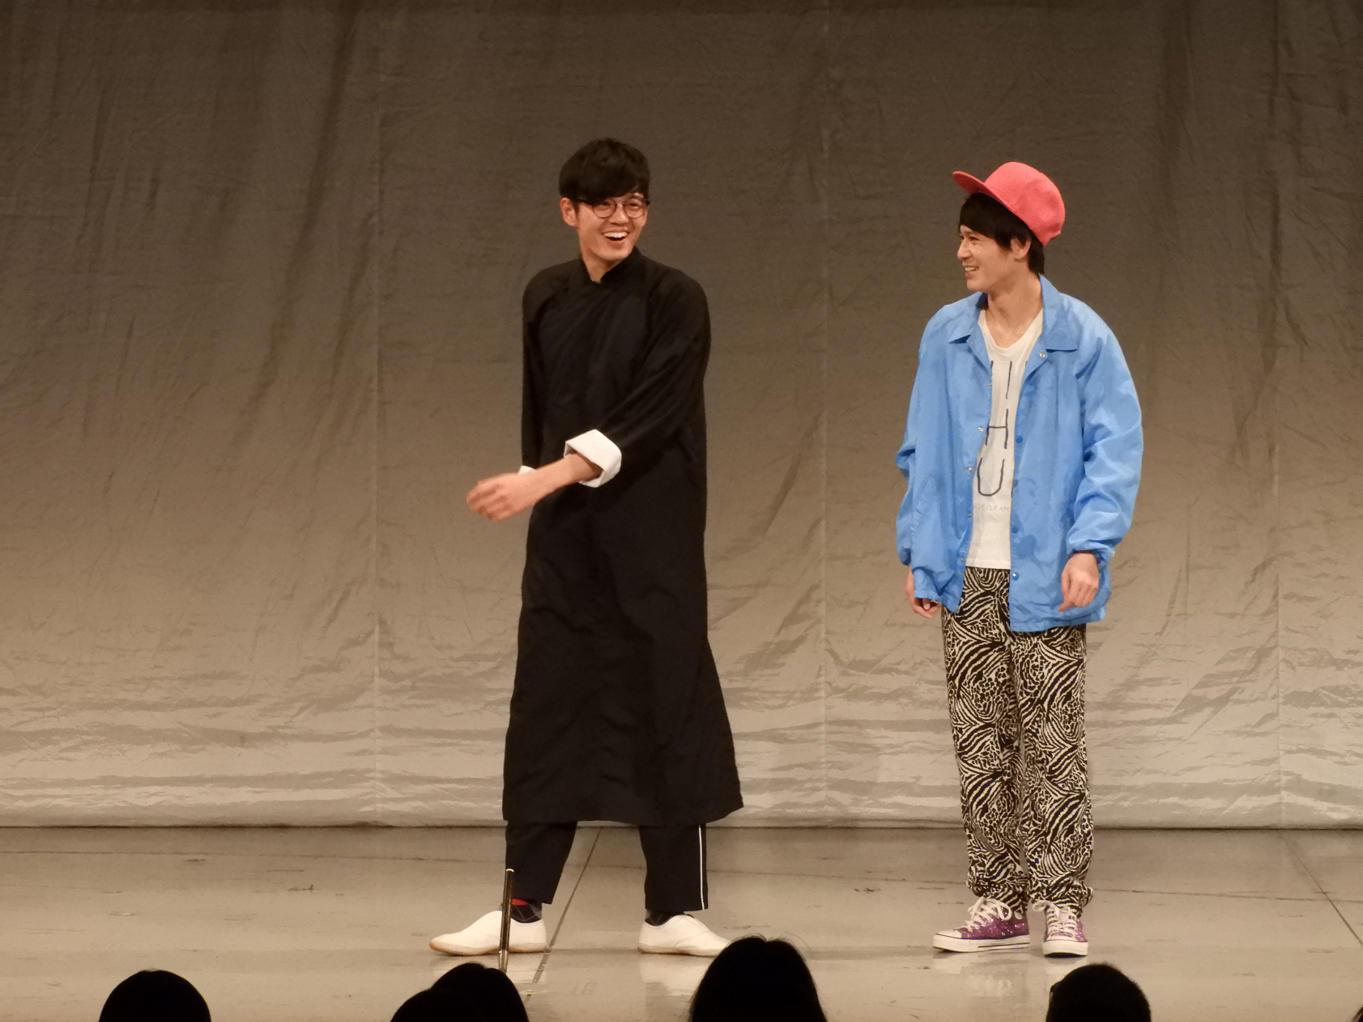 http://news.yoshimoto.co.jp/20180204153311-cd2b796de9f9af40c4e3c3ad61f8a737e390534f.jpg